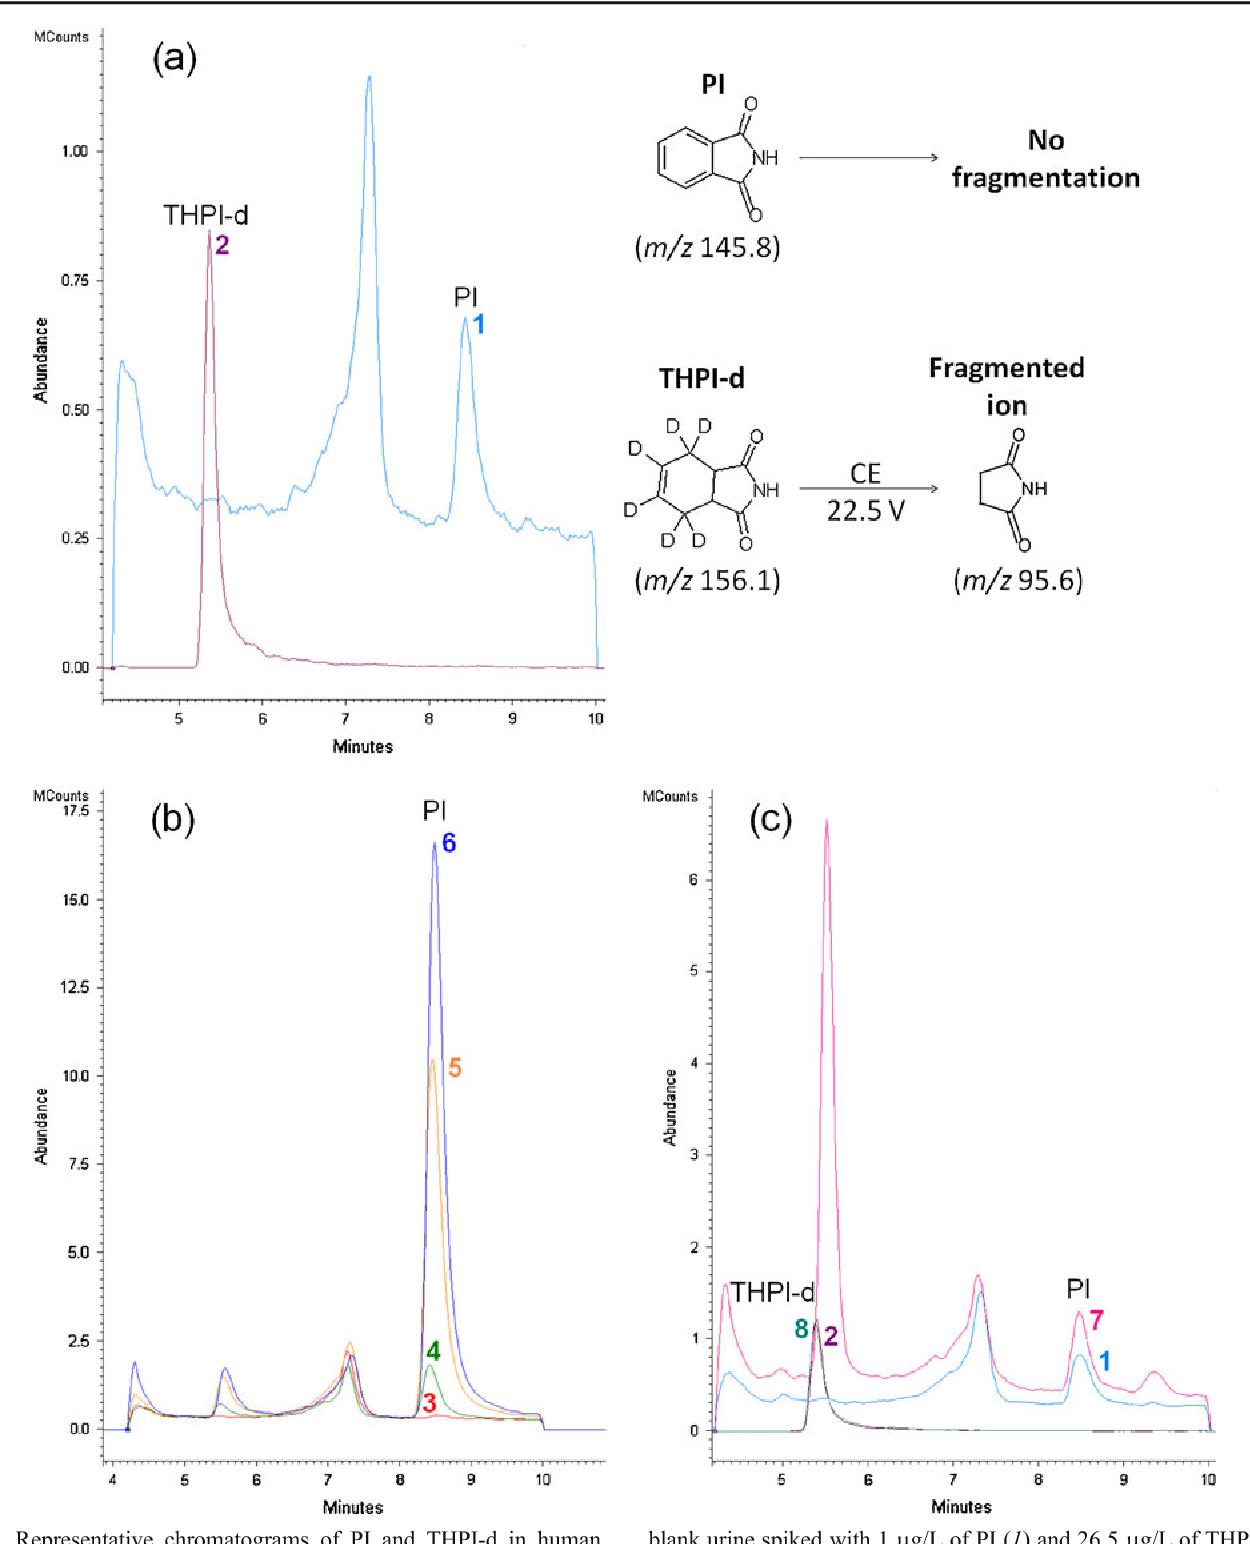 Figure 3 from Liquid chromatography-tandem mass spectrometry (LC